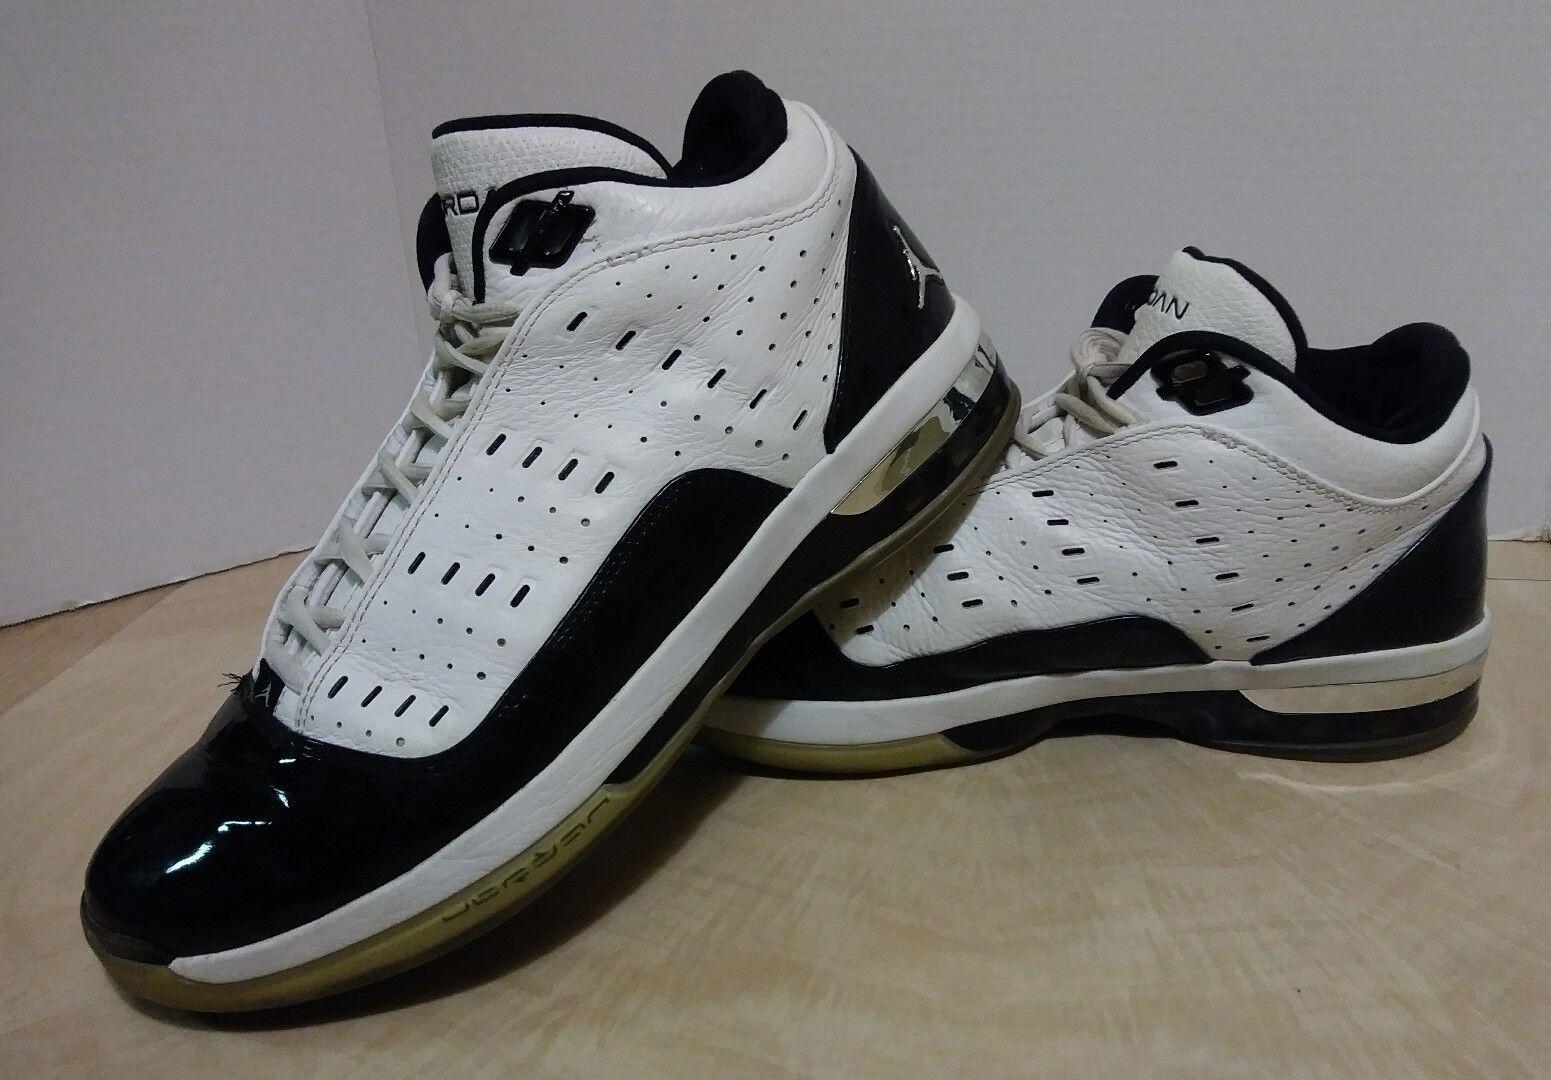 Nike Air Jordan One6One7 Basketball Shoes 407587 102 Comfortable Seasonal price cuts, discount benefits